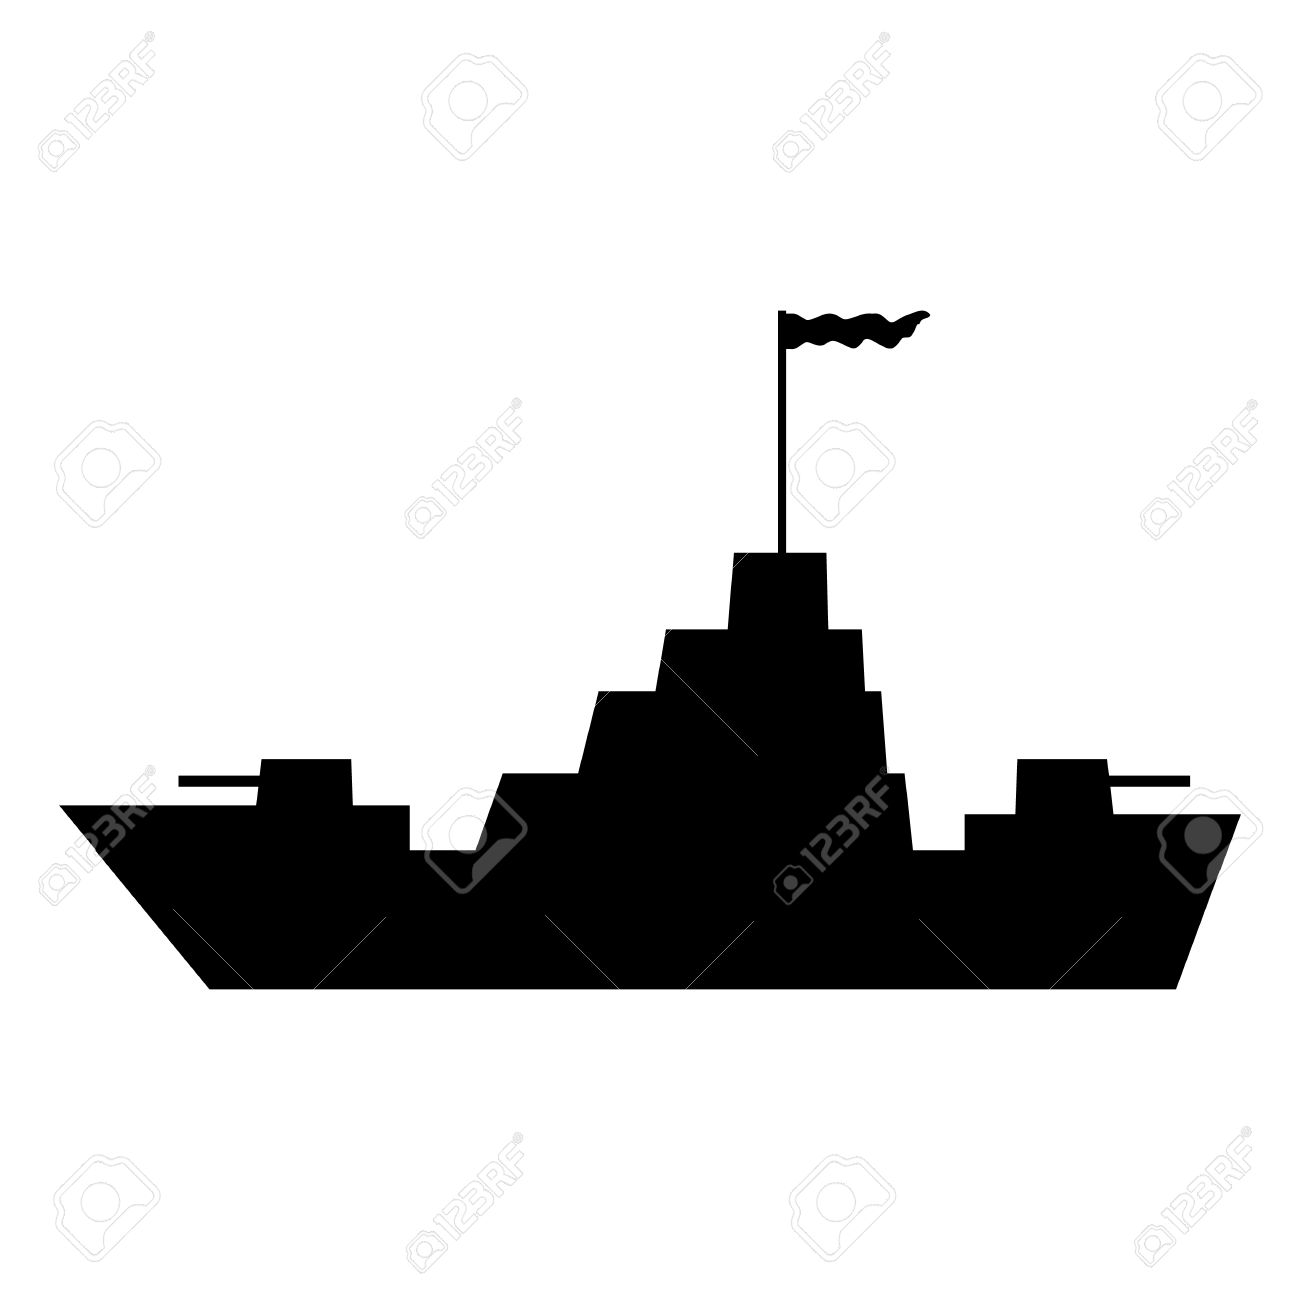 Battleship clipart naval ship. Battleships clipground